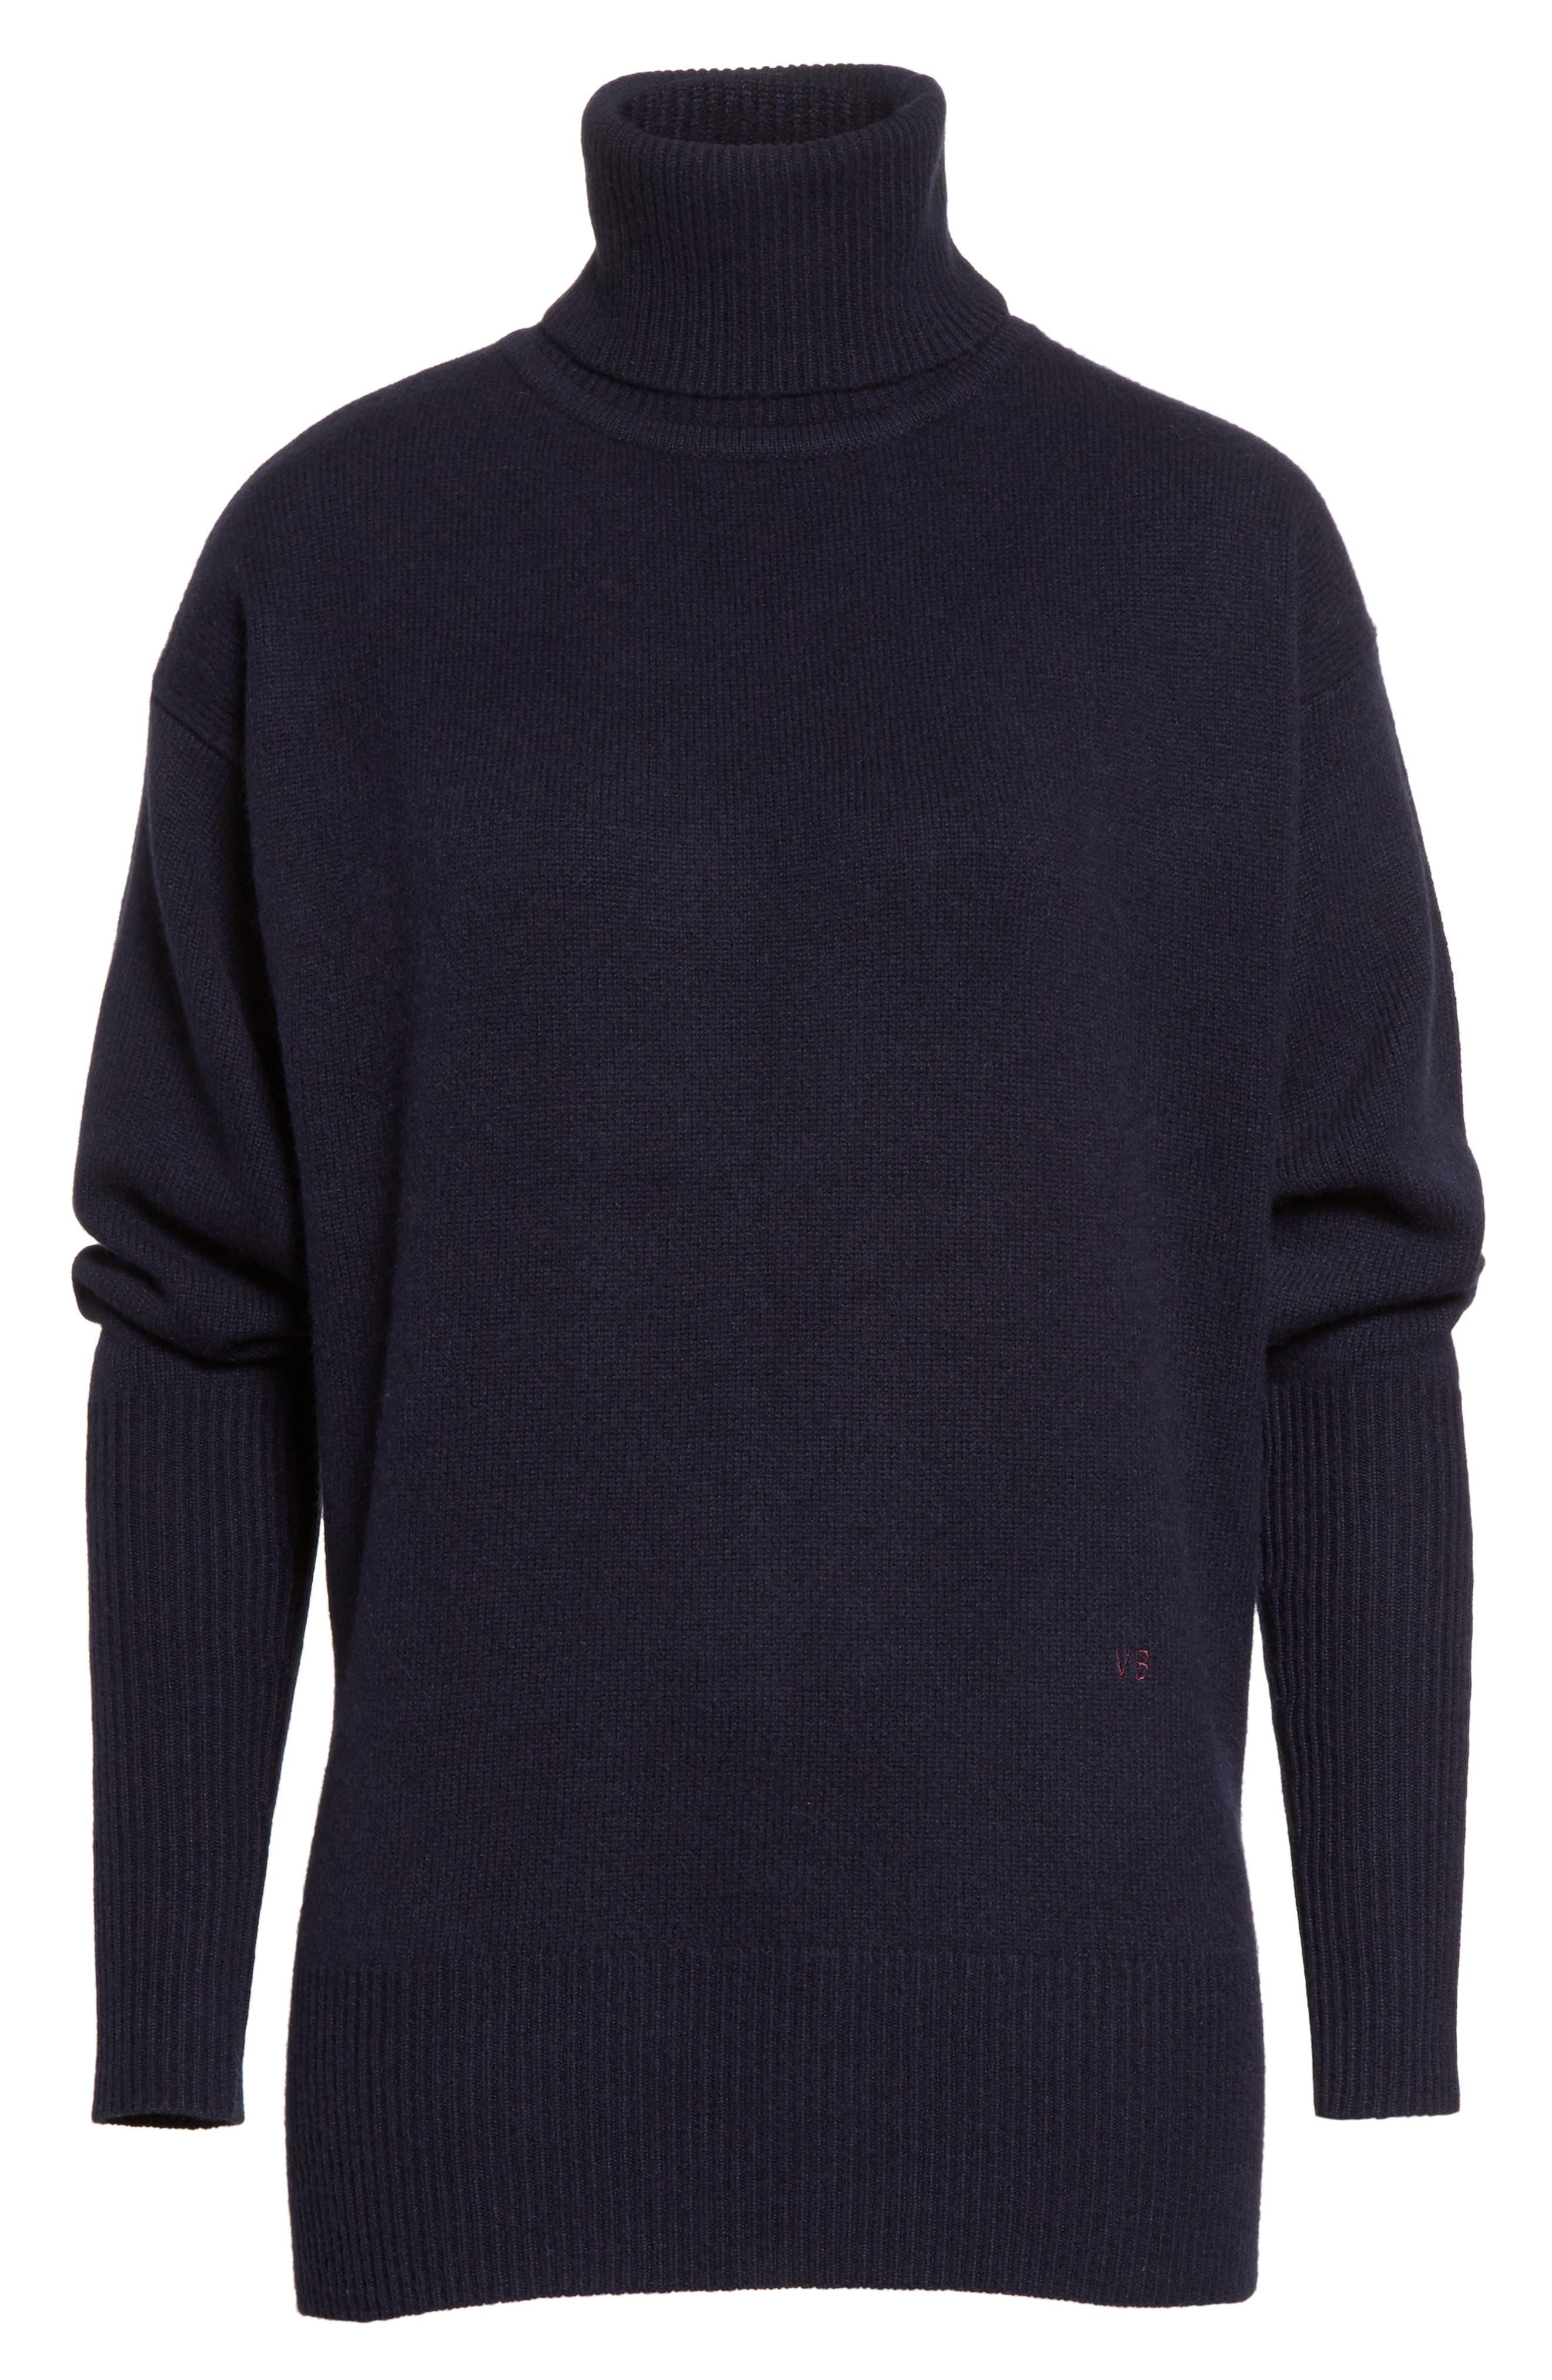 Cashmere Turtleneck Sweater,                             Alternate thumbnail 6, color,                             400